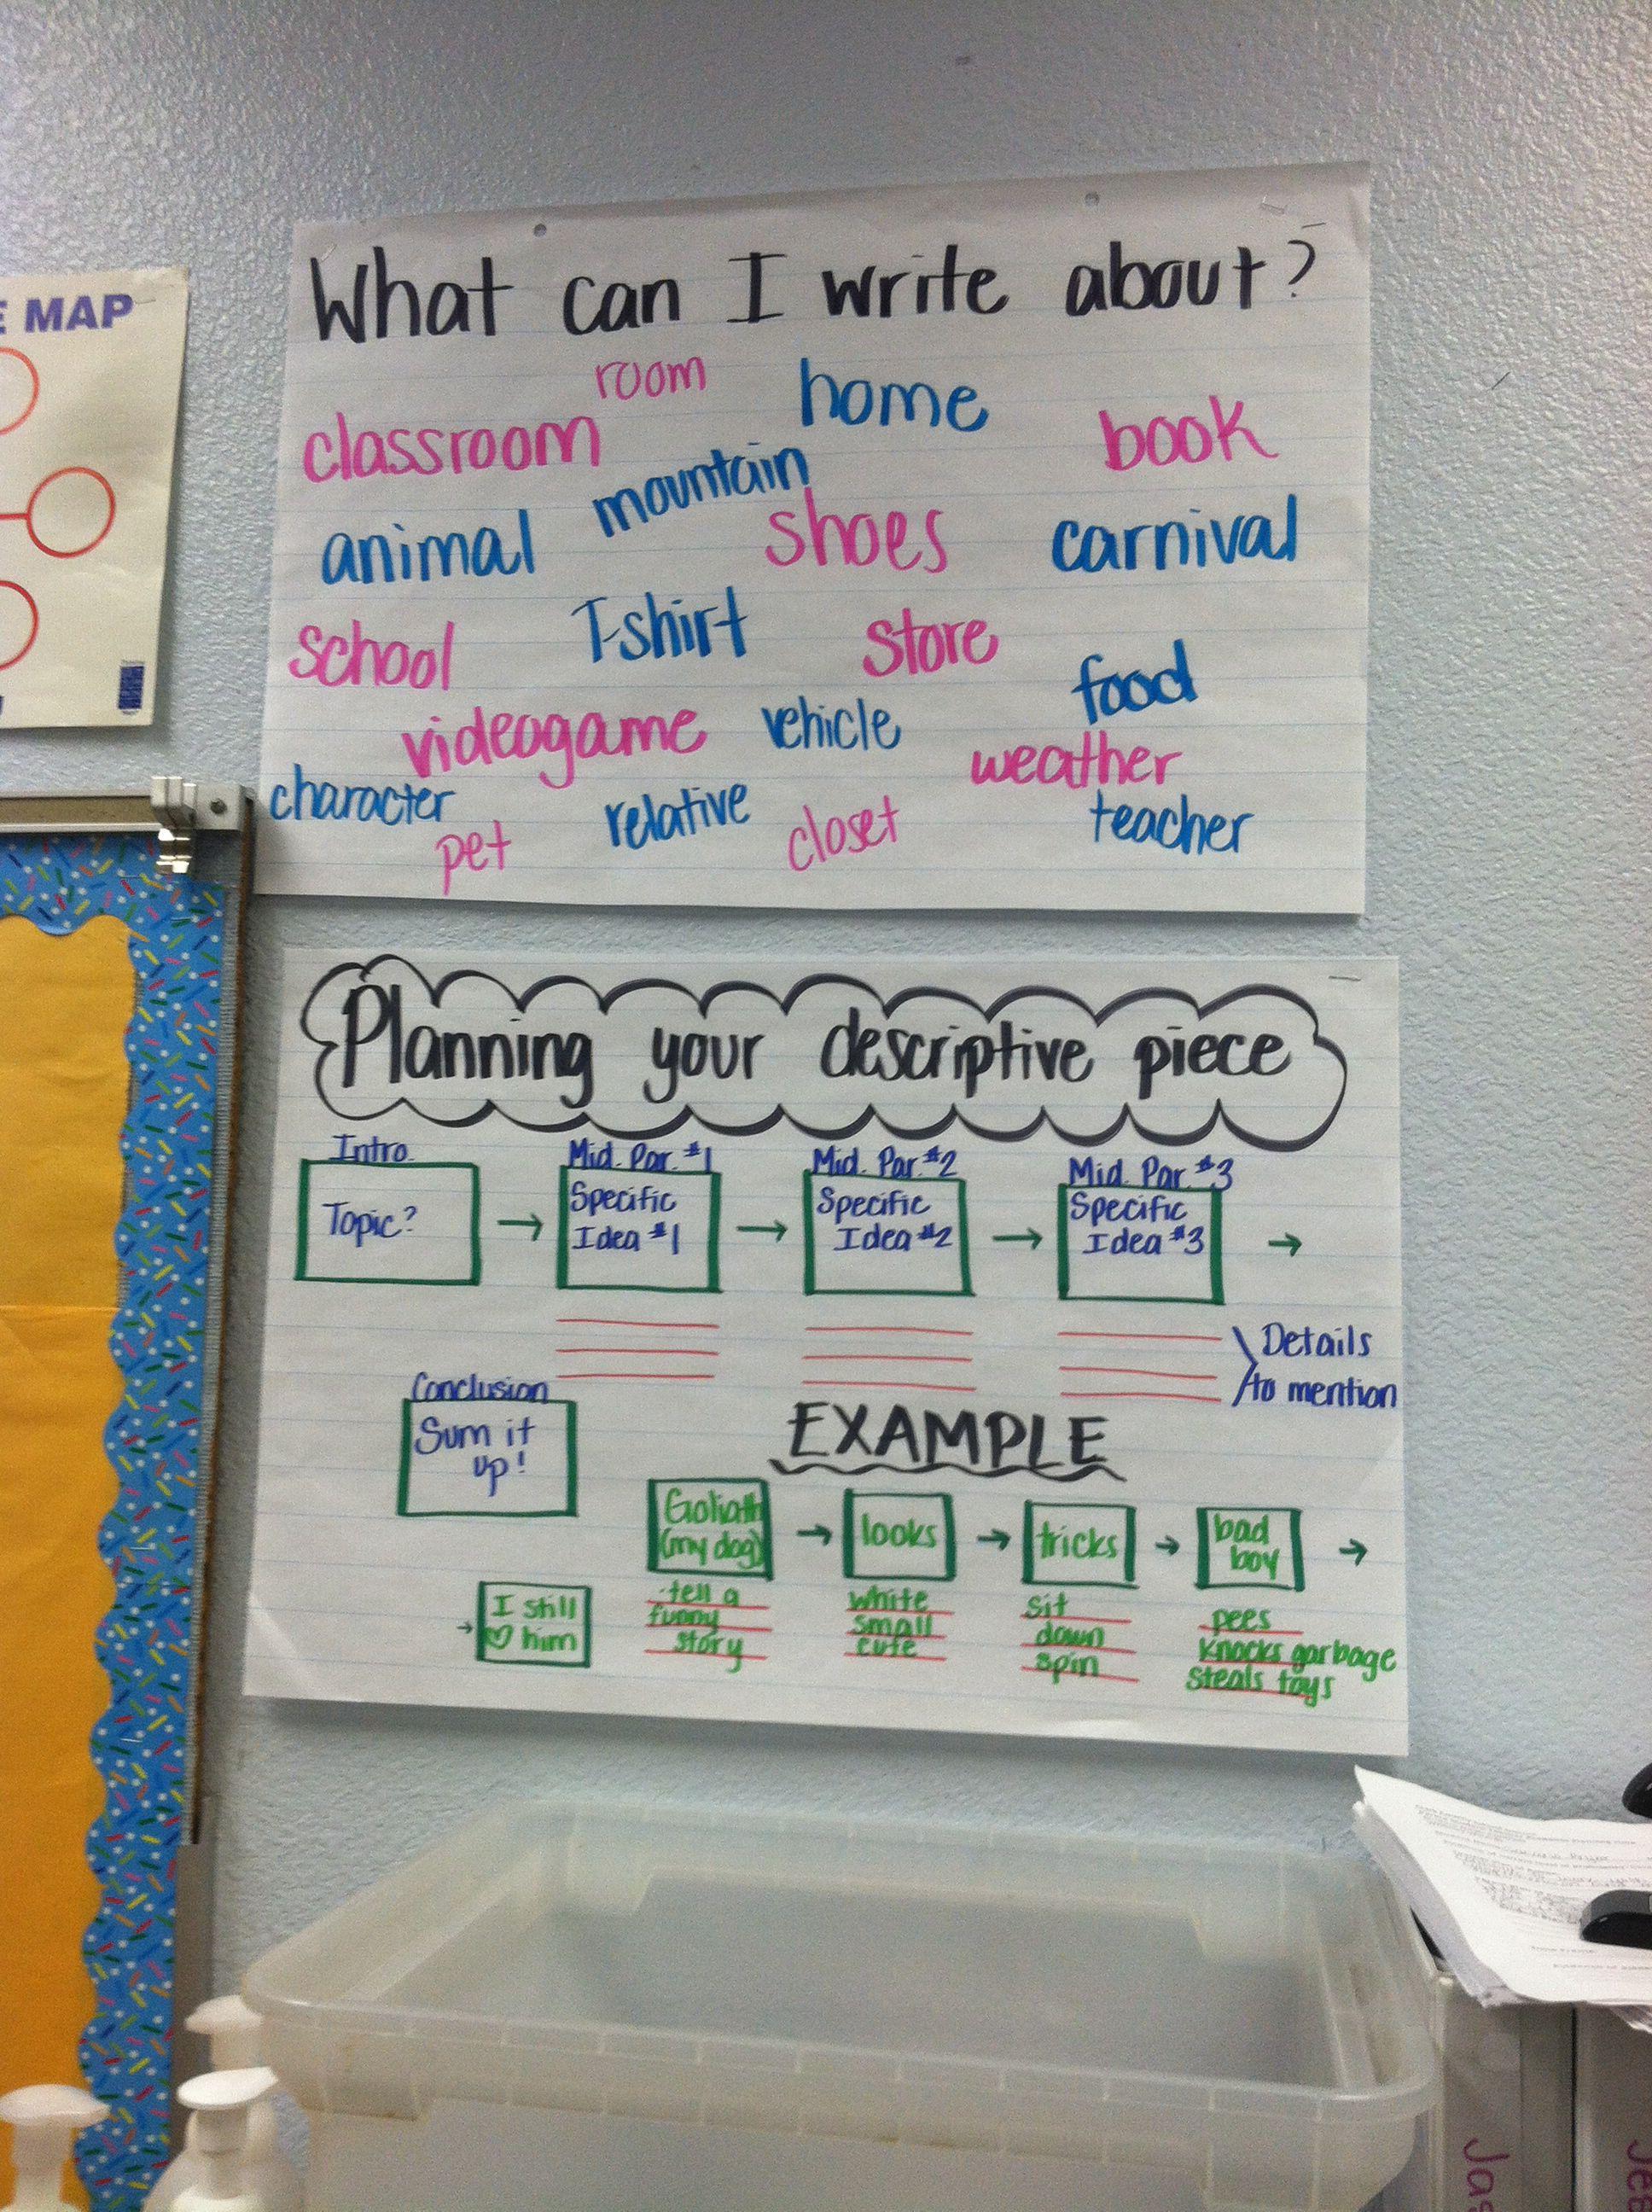 Descriptive Essay Brainstorm And Planning Using A Flea Map